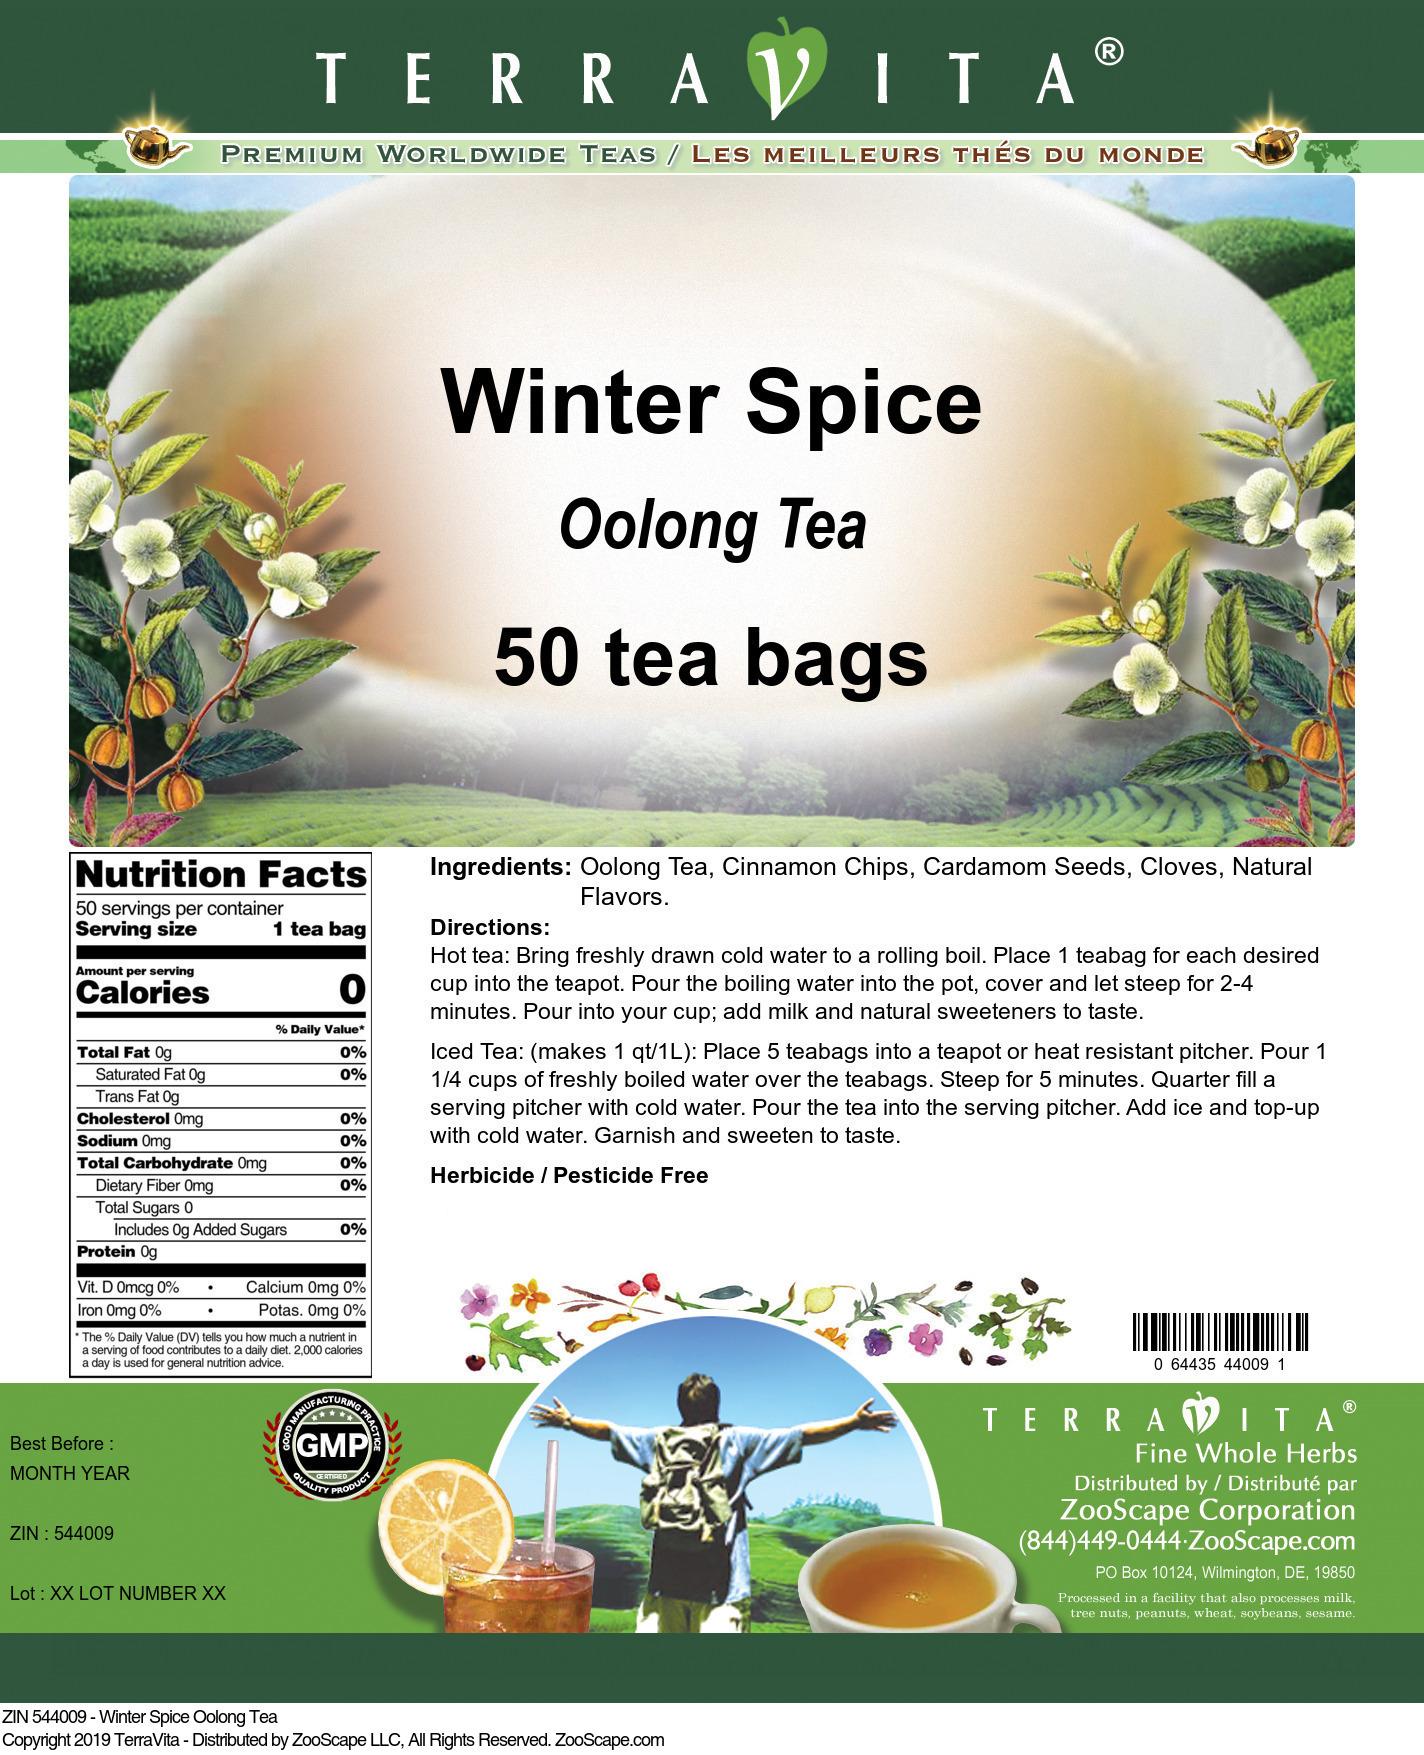 Winter Spice Oolong Tea